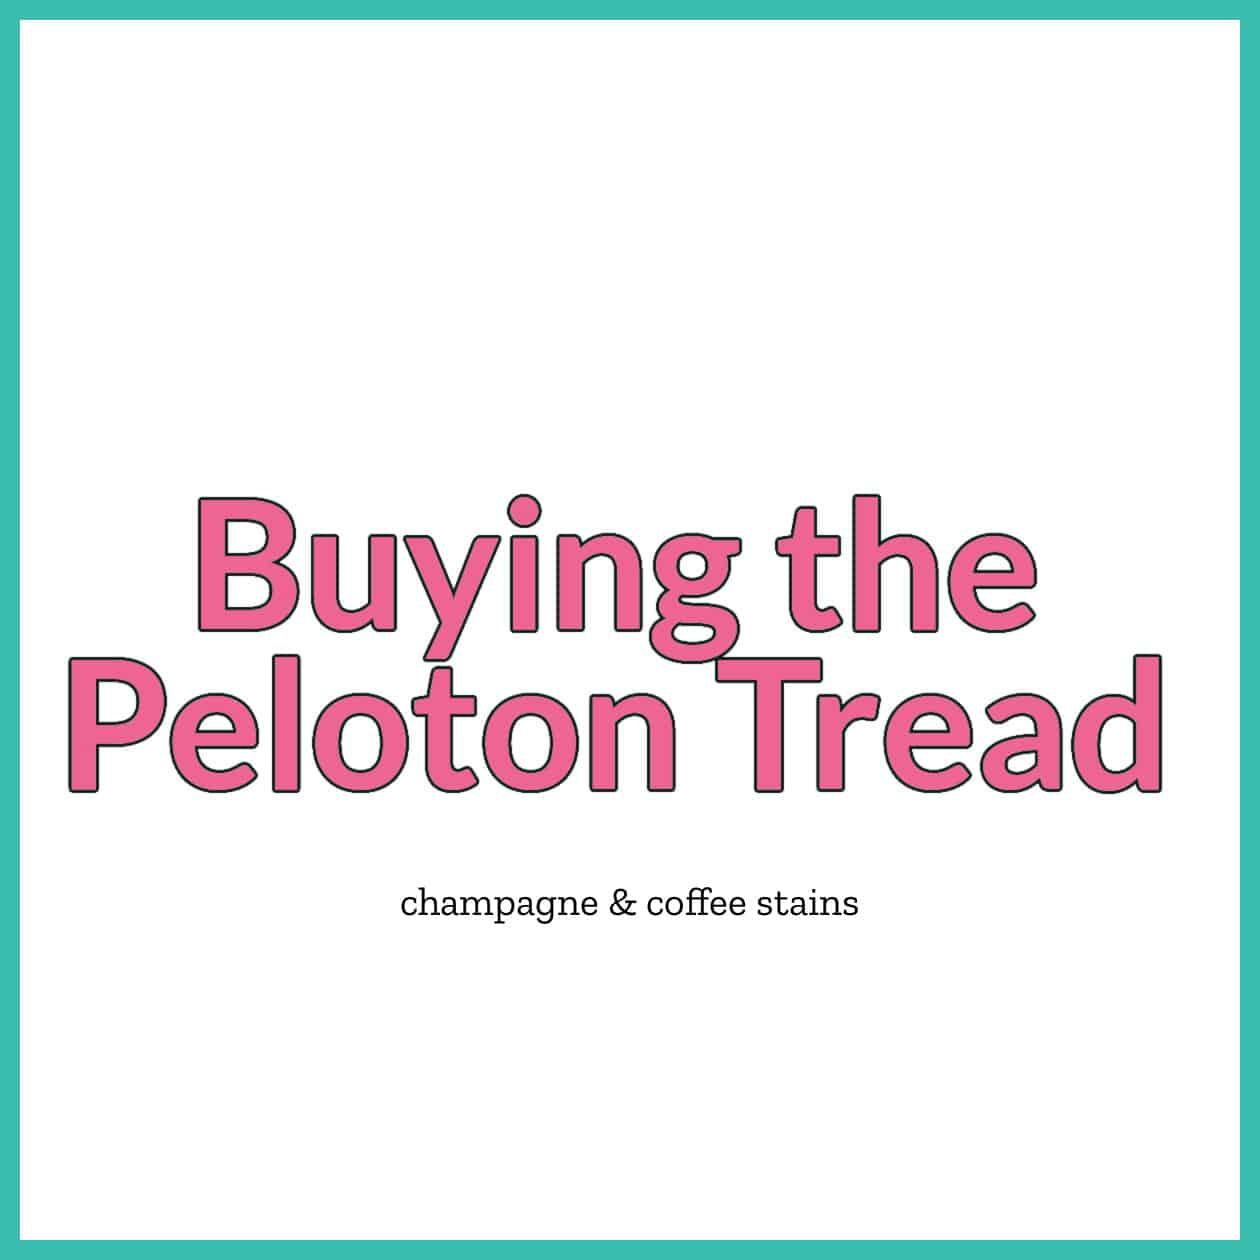 buying peloton tread blog image